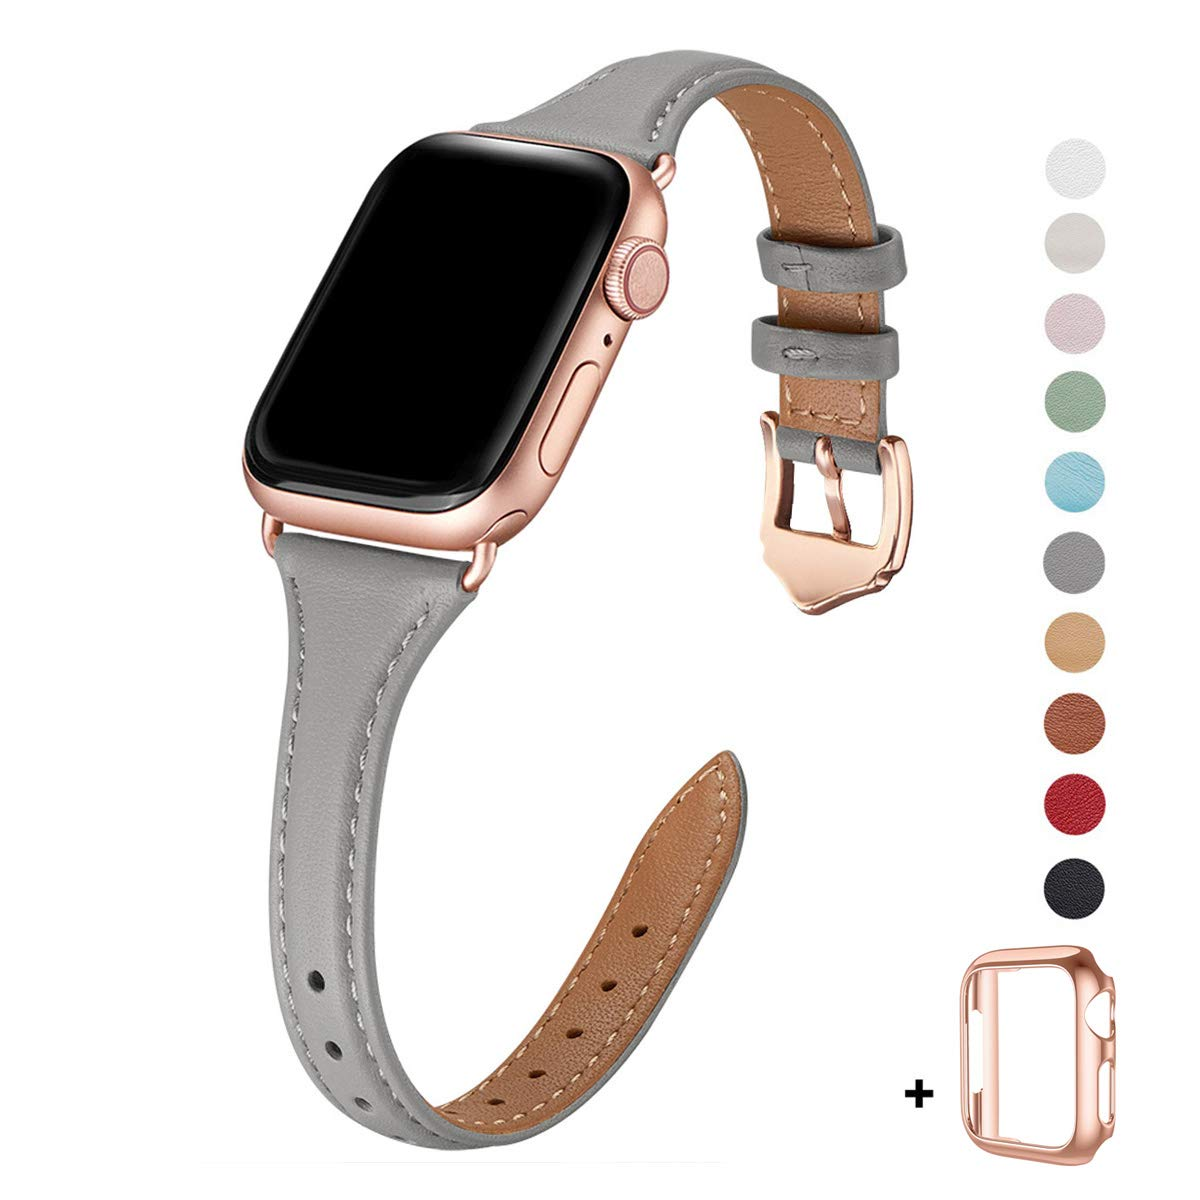 Malla Cuero para Apple Watch (38/40mm) WFEAGL [7T84C99X]